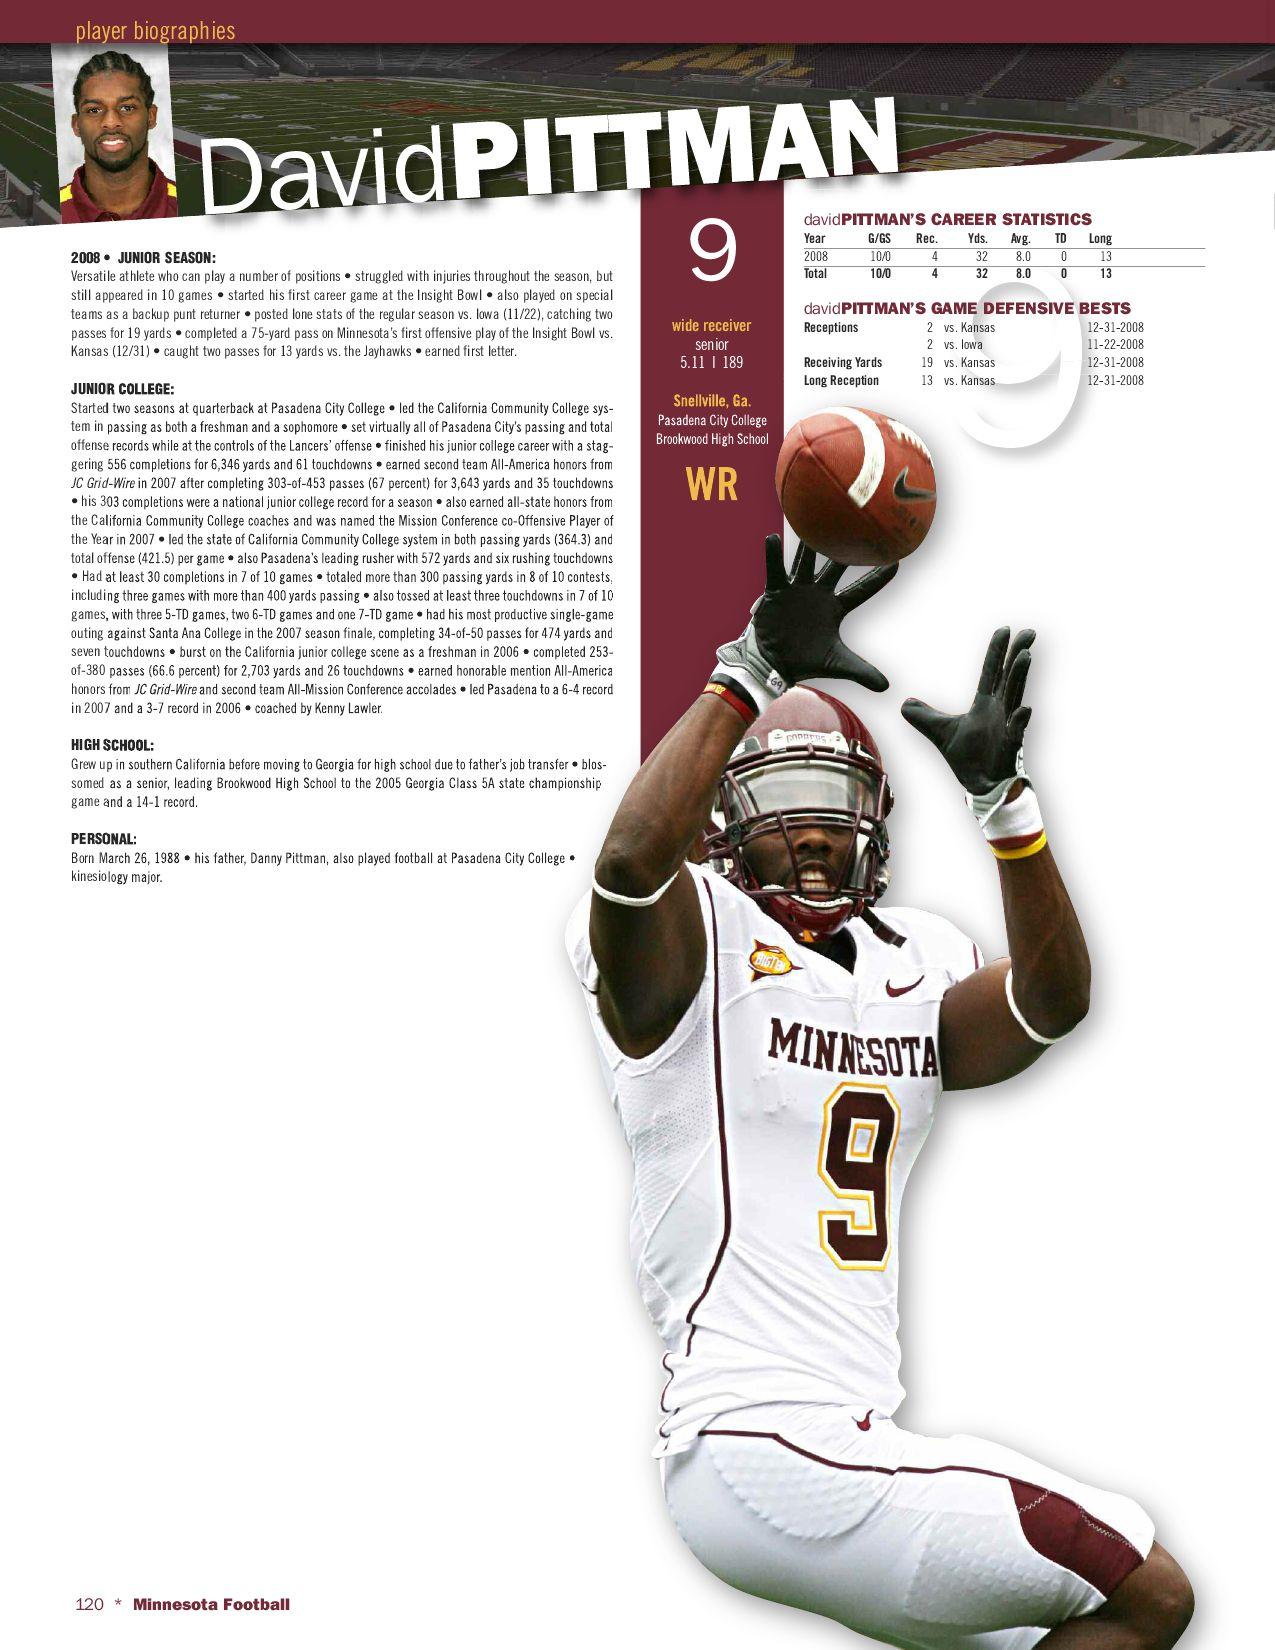 2009 Minnesota Football Recruiting Guide by University of